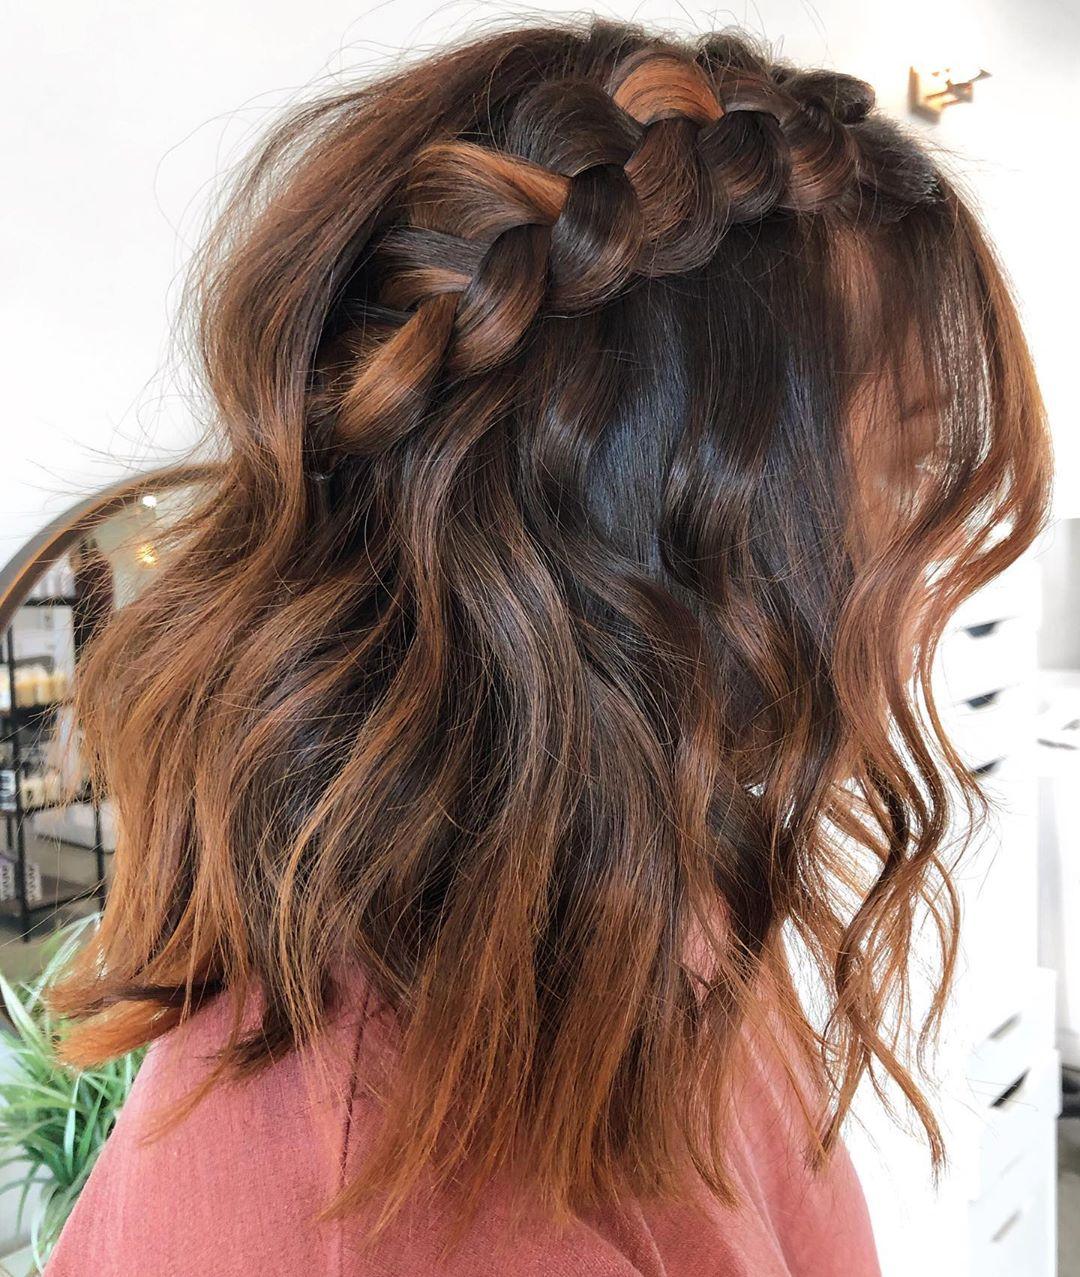 новинки для волос средней длины фото 16